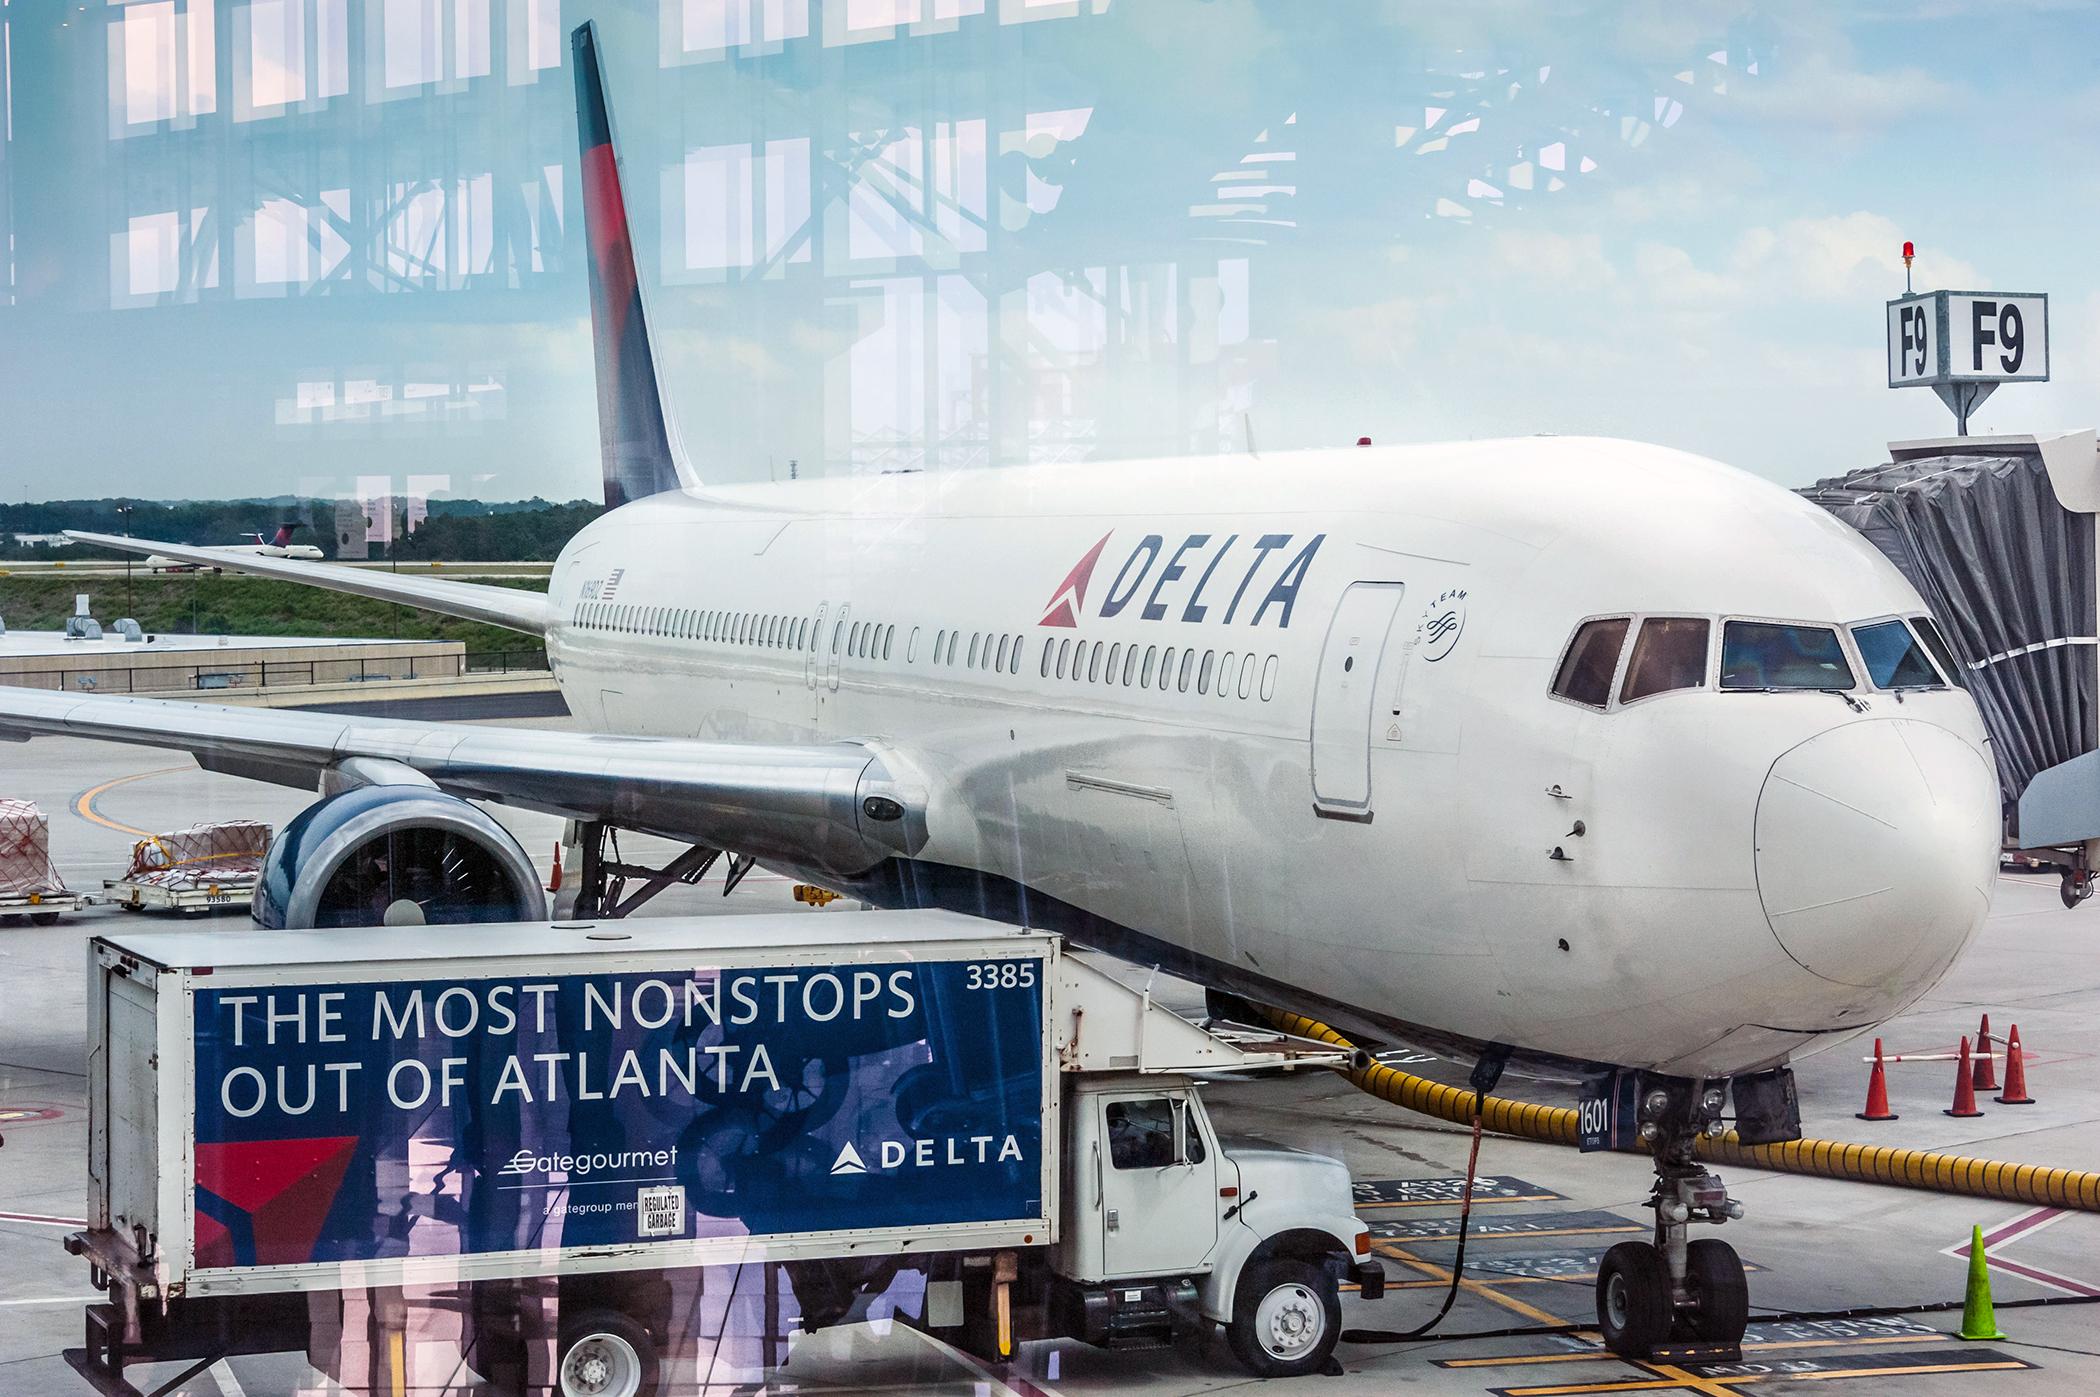 Delta Airlines passenger jet and service truck at Atlanta International Airport .